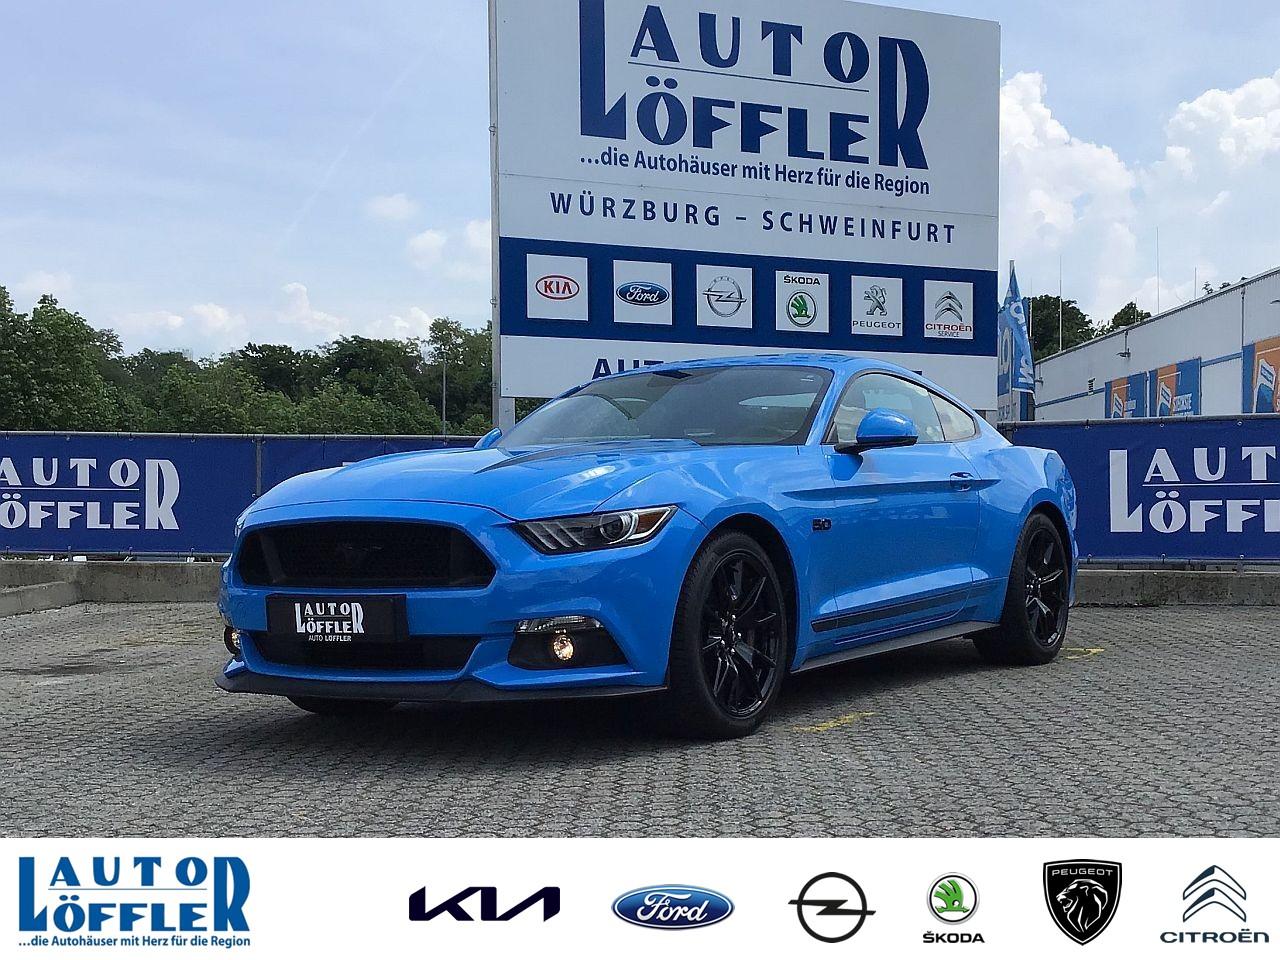 Ford Mustang GT 5.0 l - Navi RFK SHZ Klima Klima, Jahr 2017, Benzin